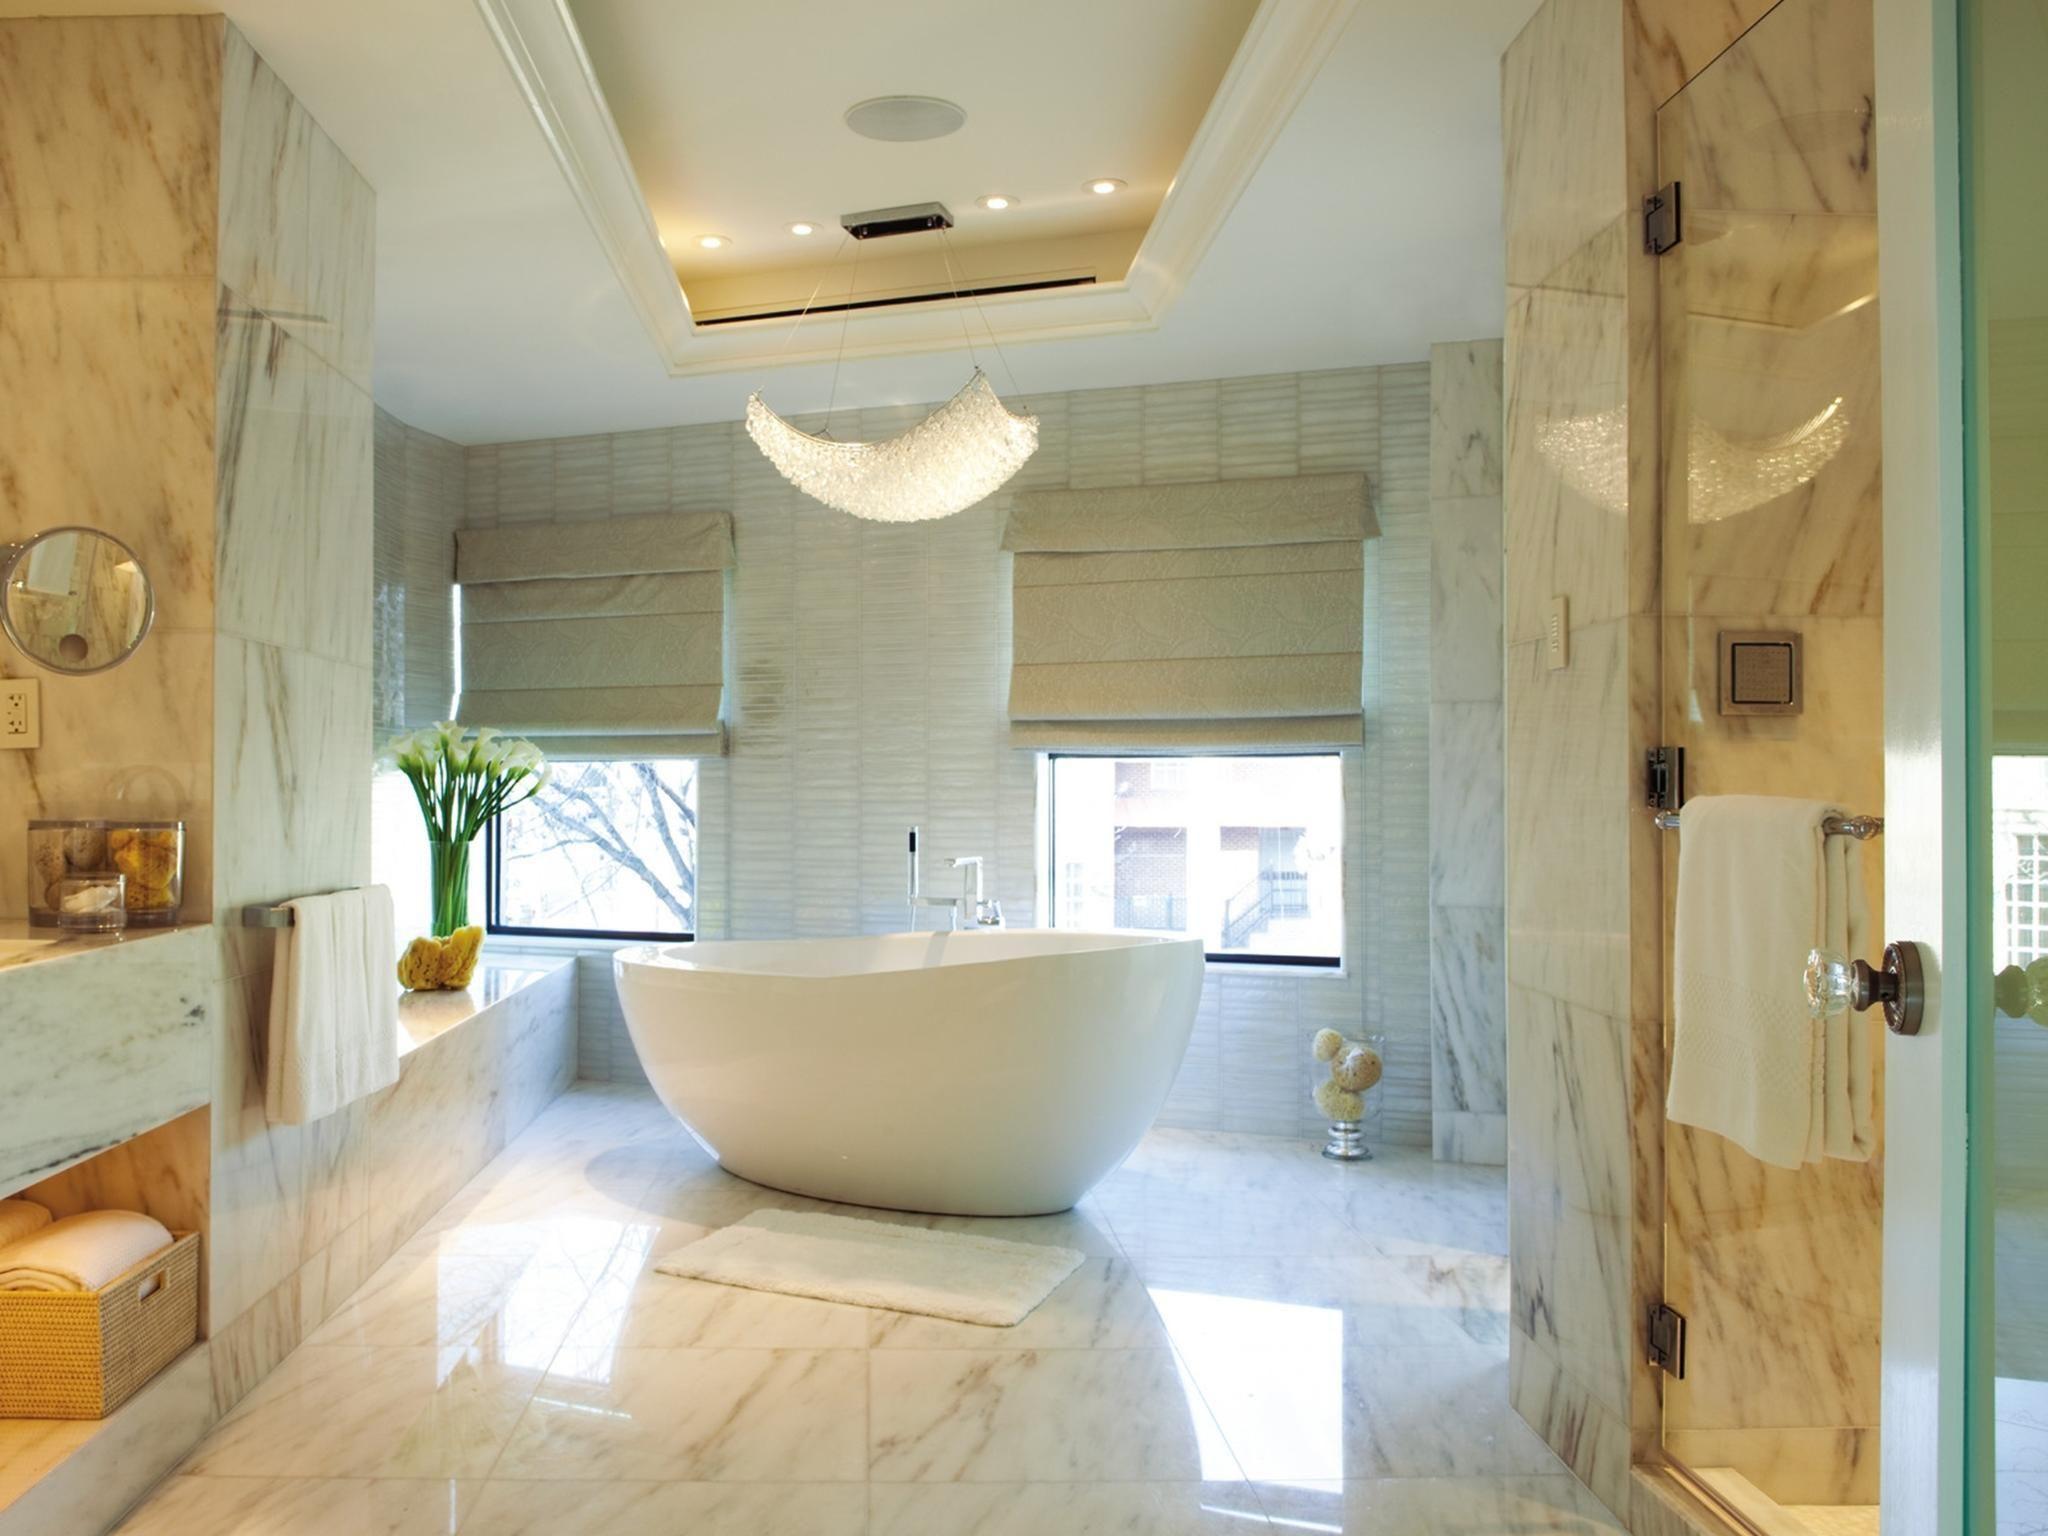 4Bathroom Remodel Upscale  Interiors  Pinterest  Interiors Extraordinary Spa Bathroom Remodel Decorating Inspiration